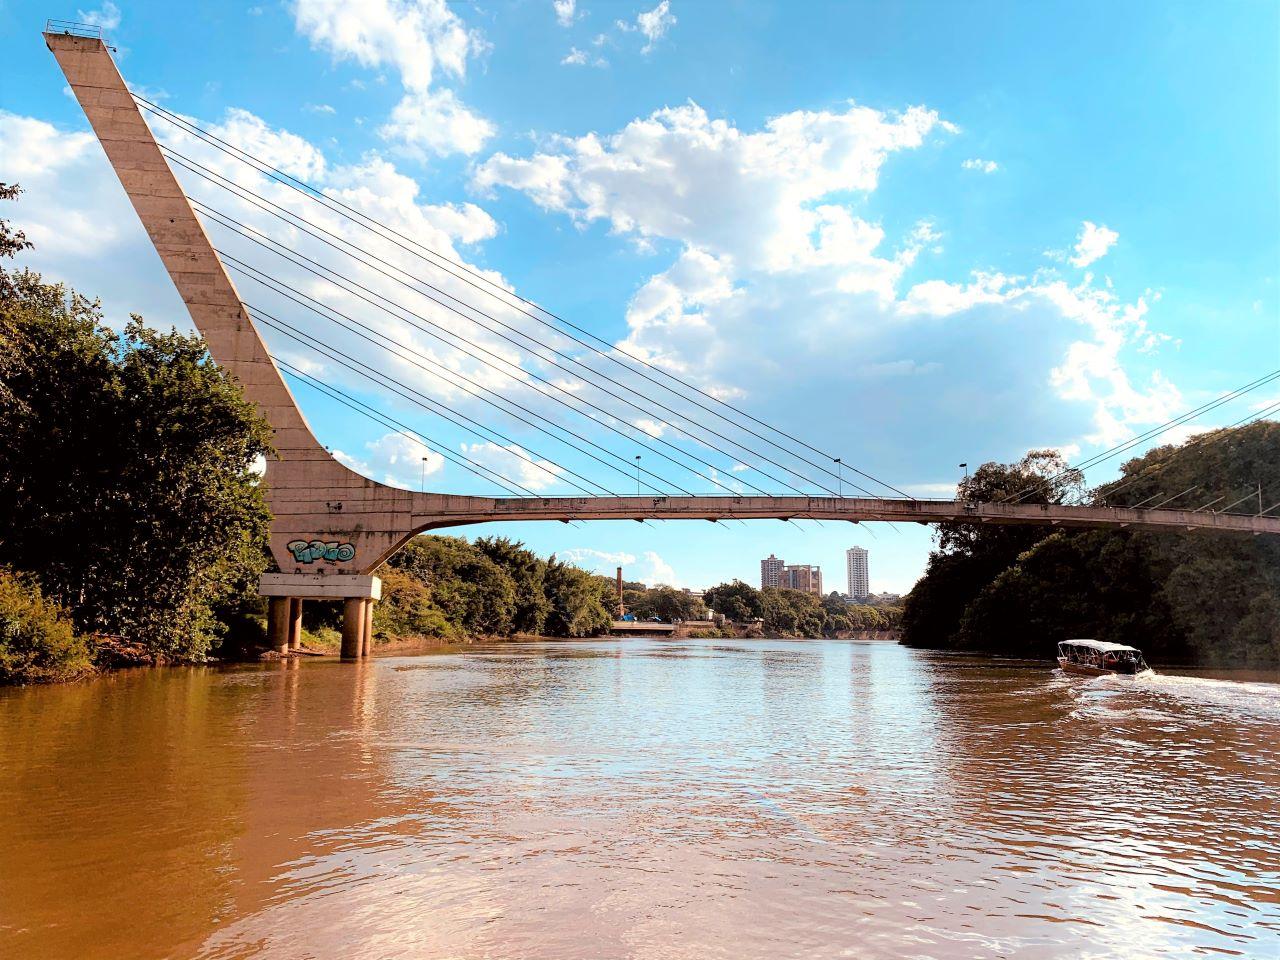 ponte, rio e barco a motor